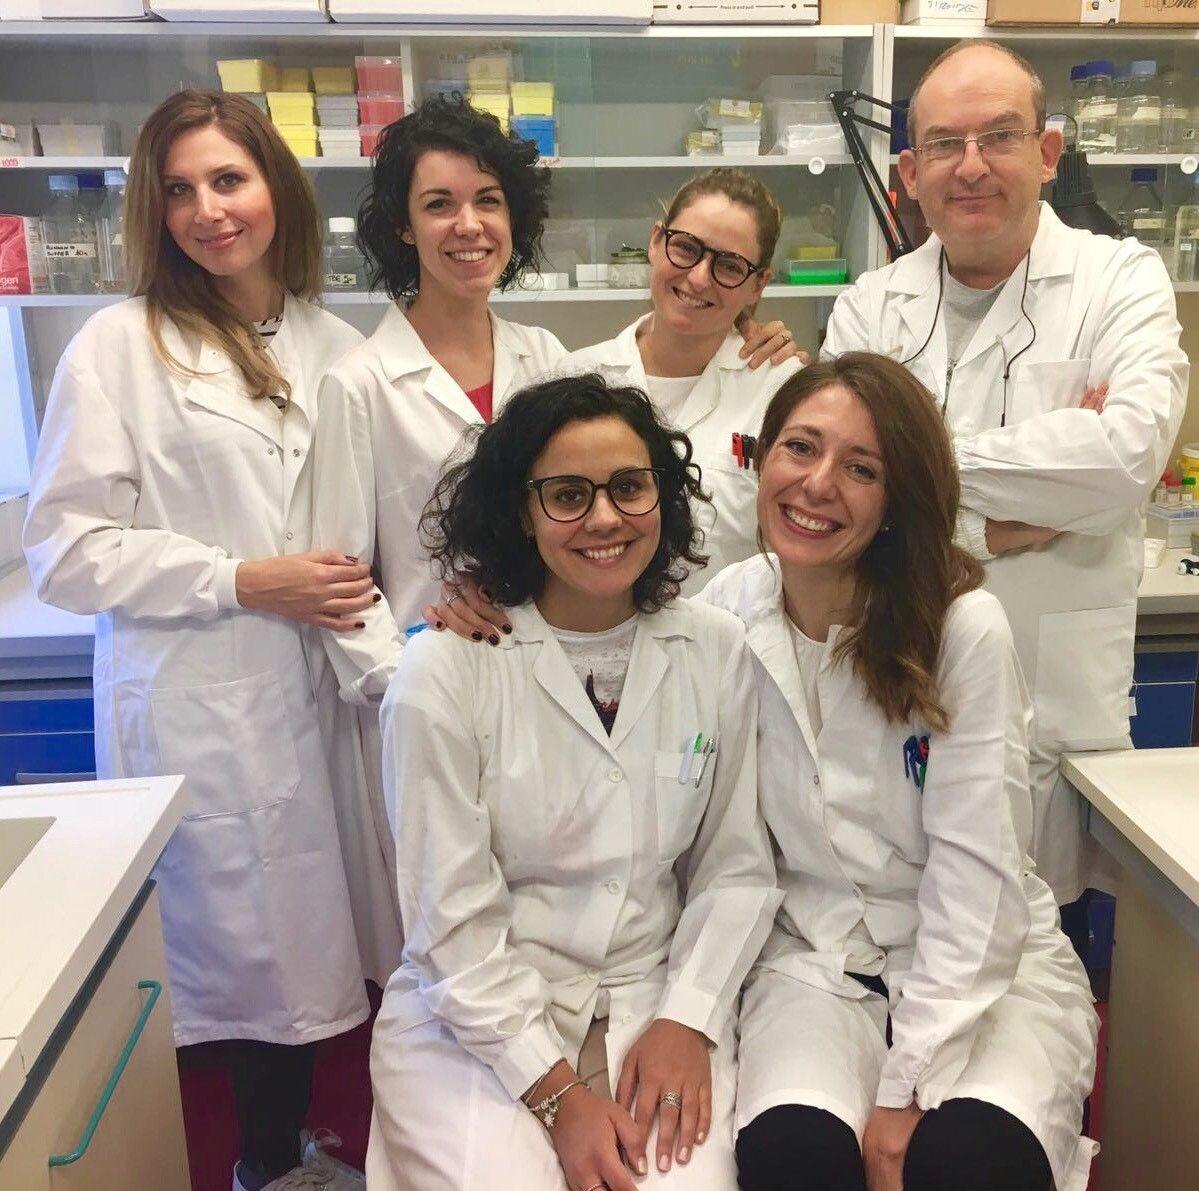 2. Da sinistra, in piedi Giovanna Mangiapane, Silvia Burra, Marta Codrich, Gianluca Tell; sedute Matilde Clarissa Malfatti, Giulia Antoniali